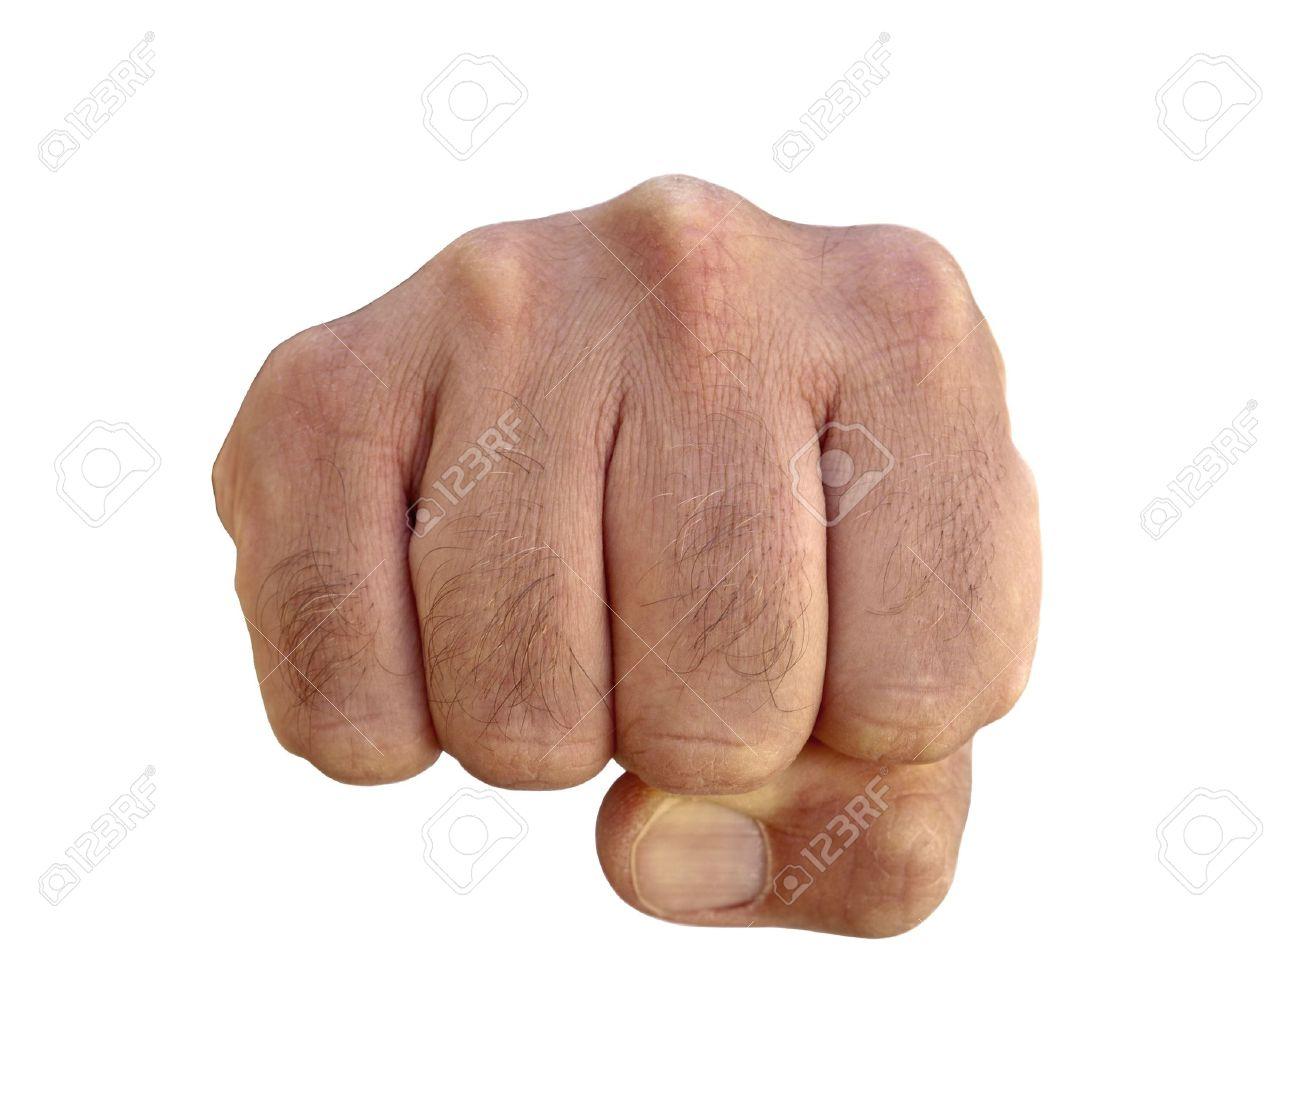 Русский кулак фото 10 фотография